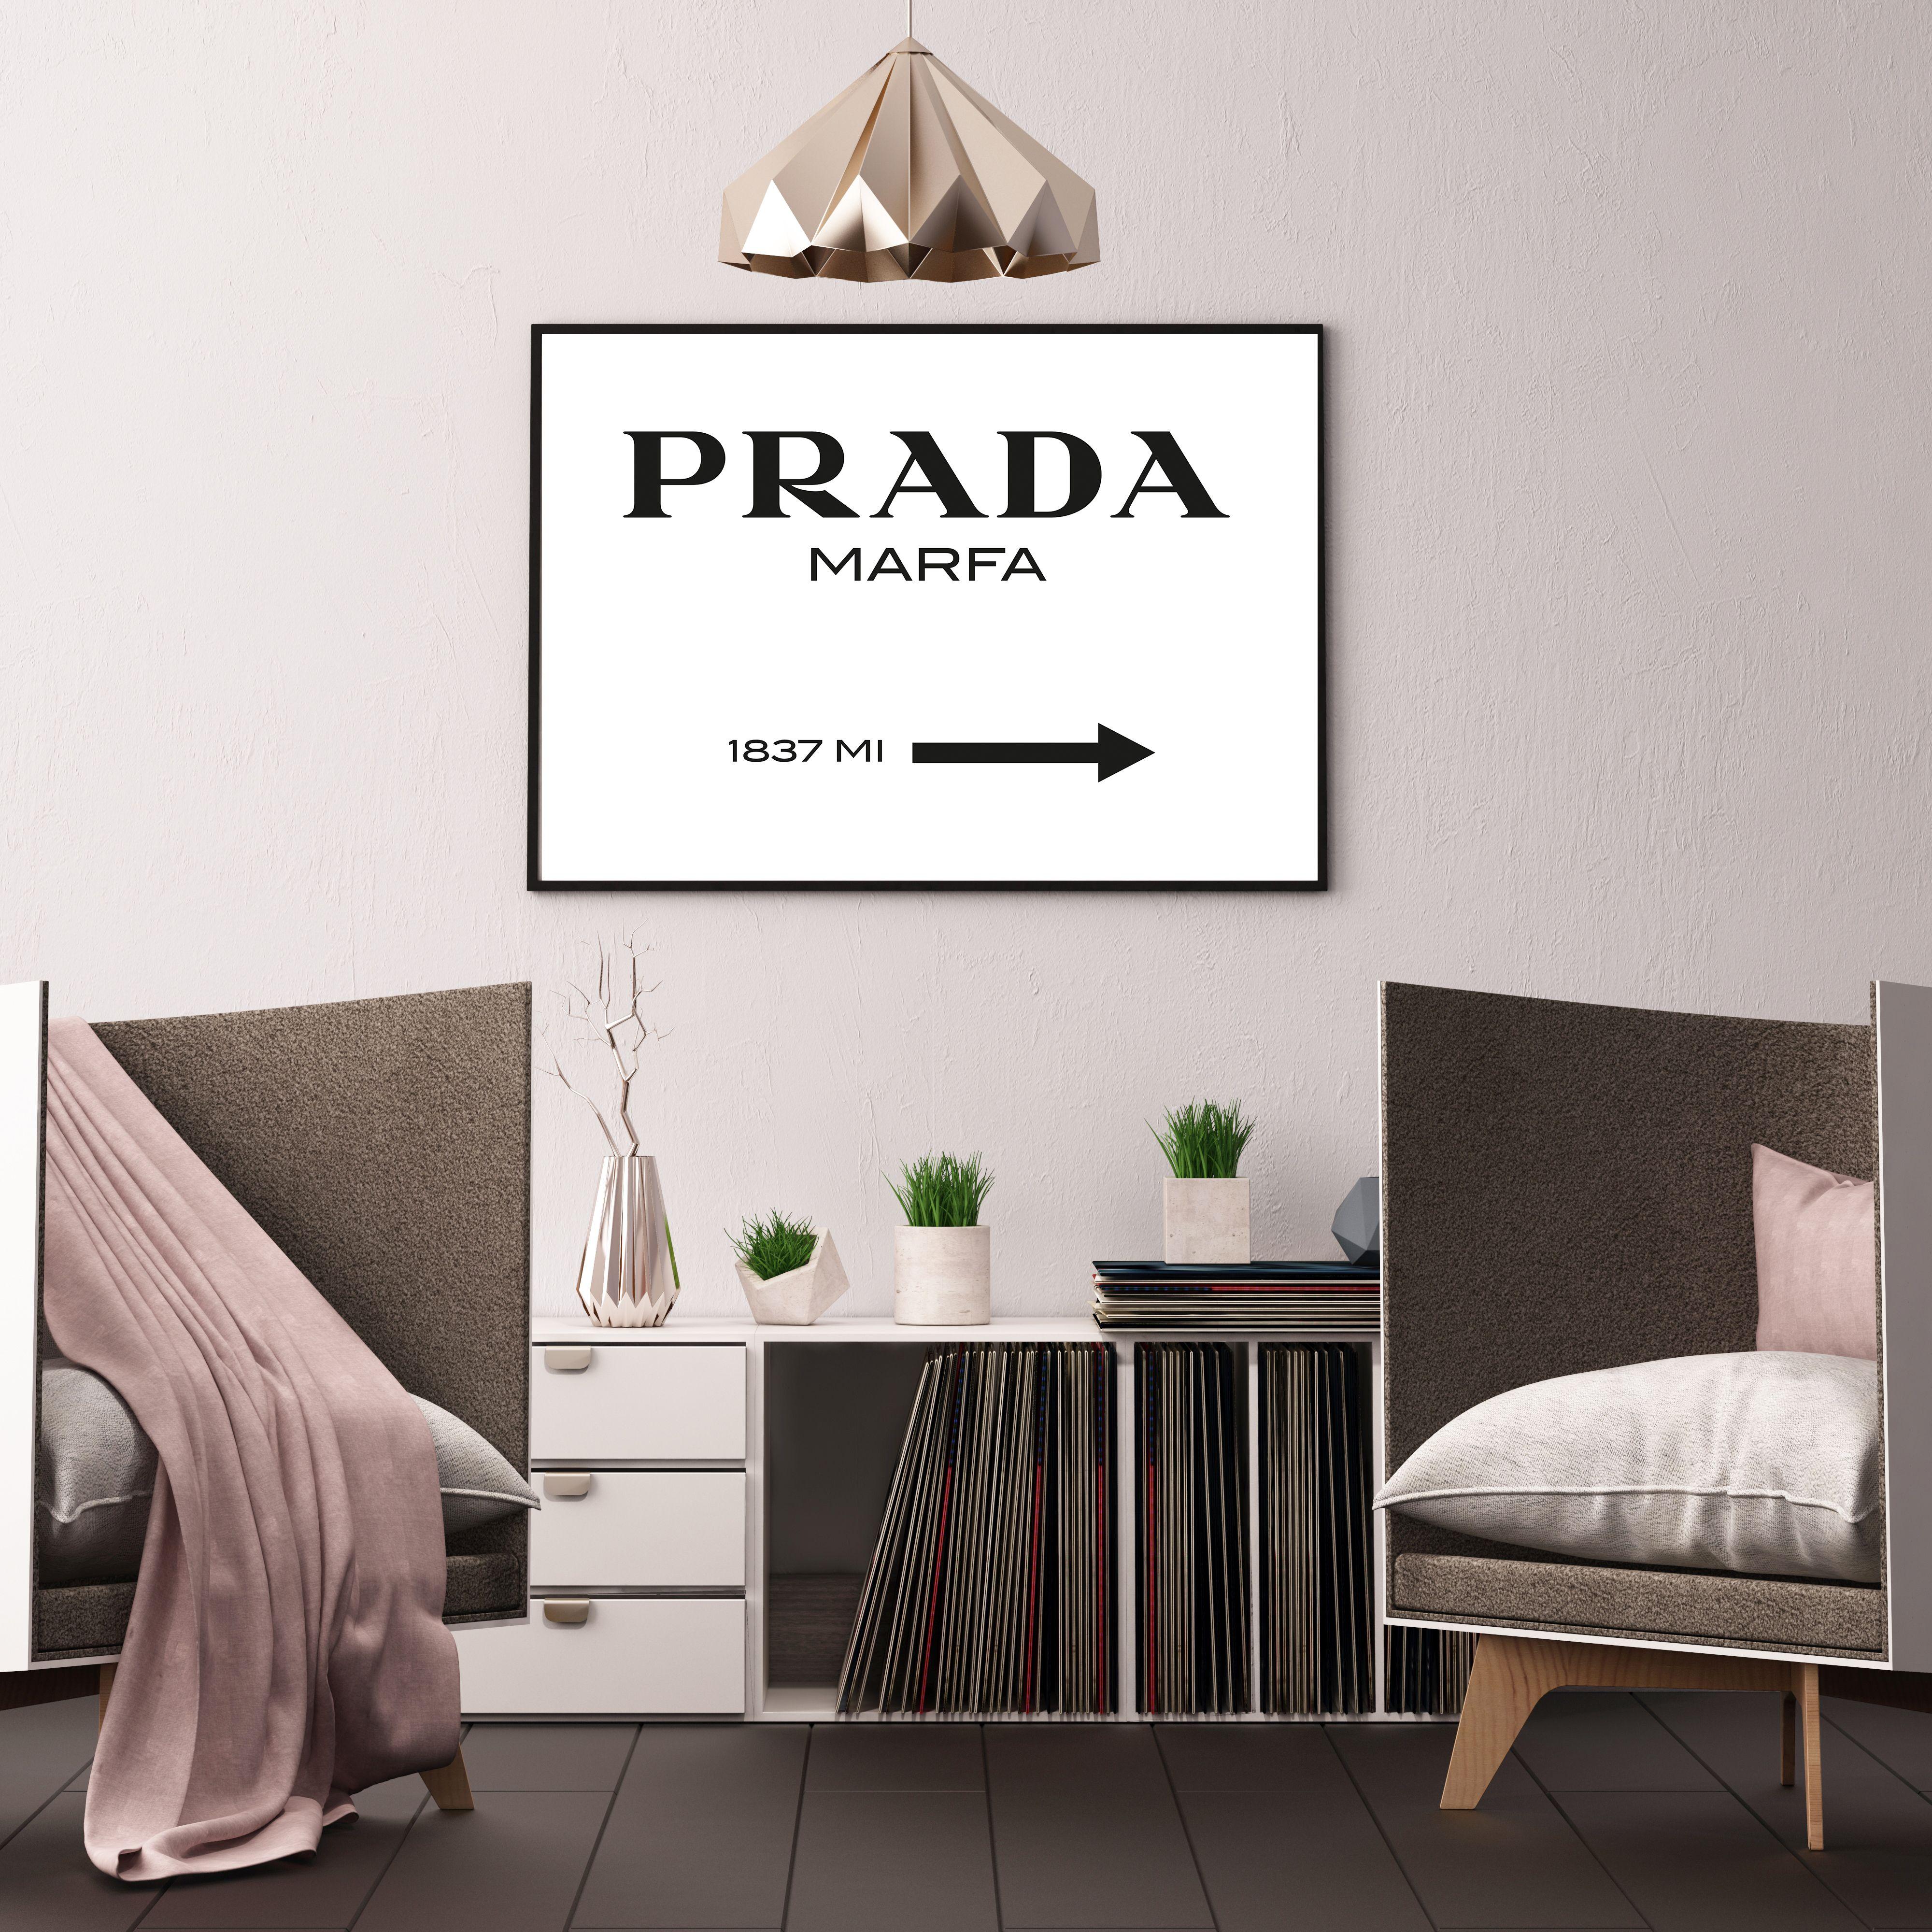 Prada Marfa Framed Art Print On Society6 Perfect Designer Piece For The Fashion Forward Interior Decorators Interior Interior Styling Prada Marfa